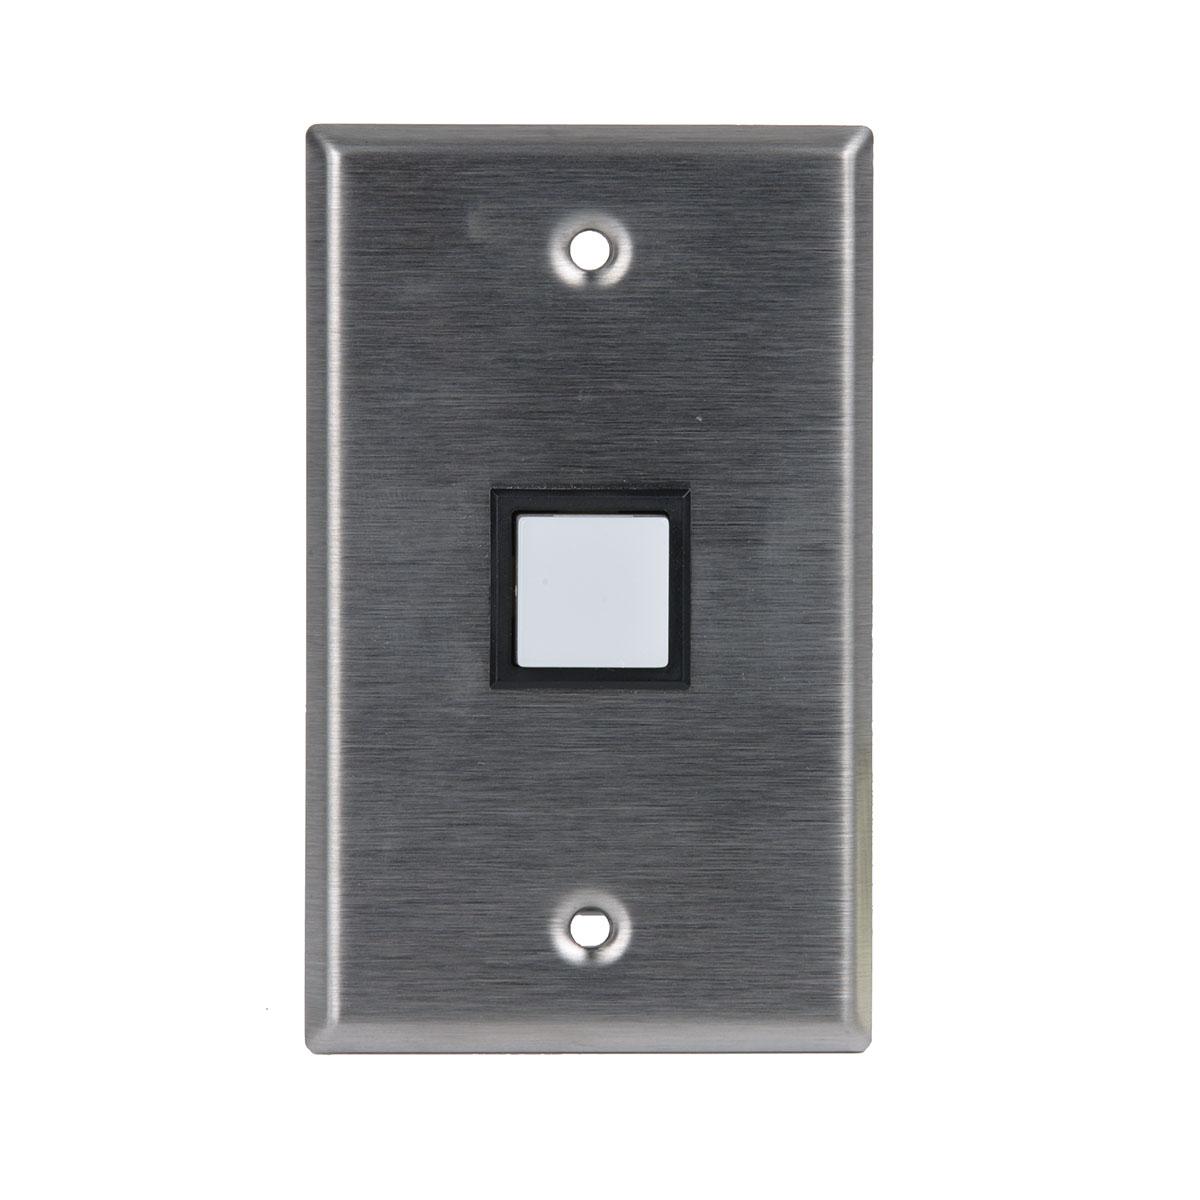 980 Economy Push Button Switches Rci Dormakaba Switch Ead